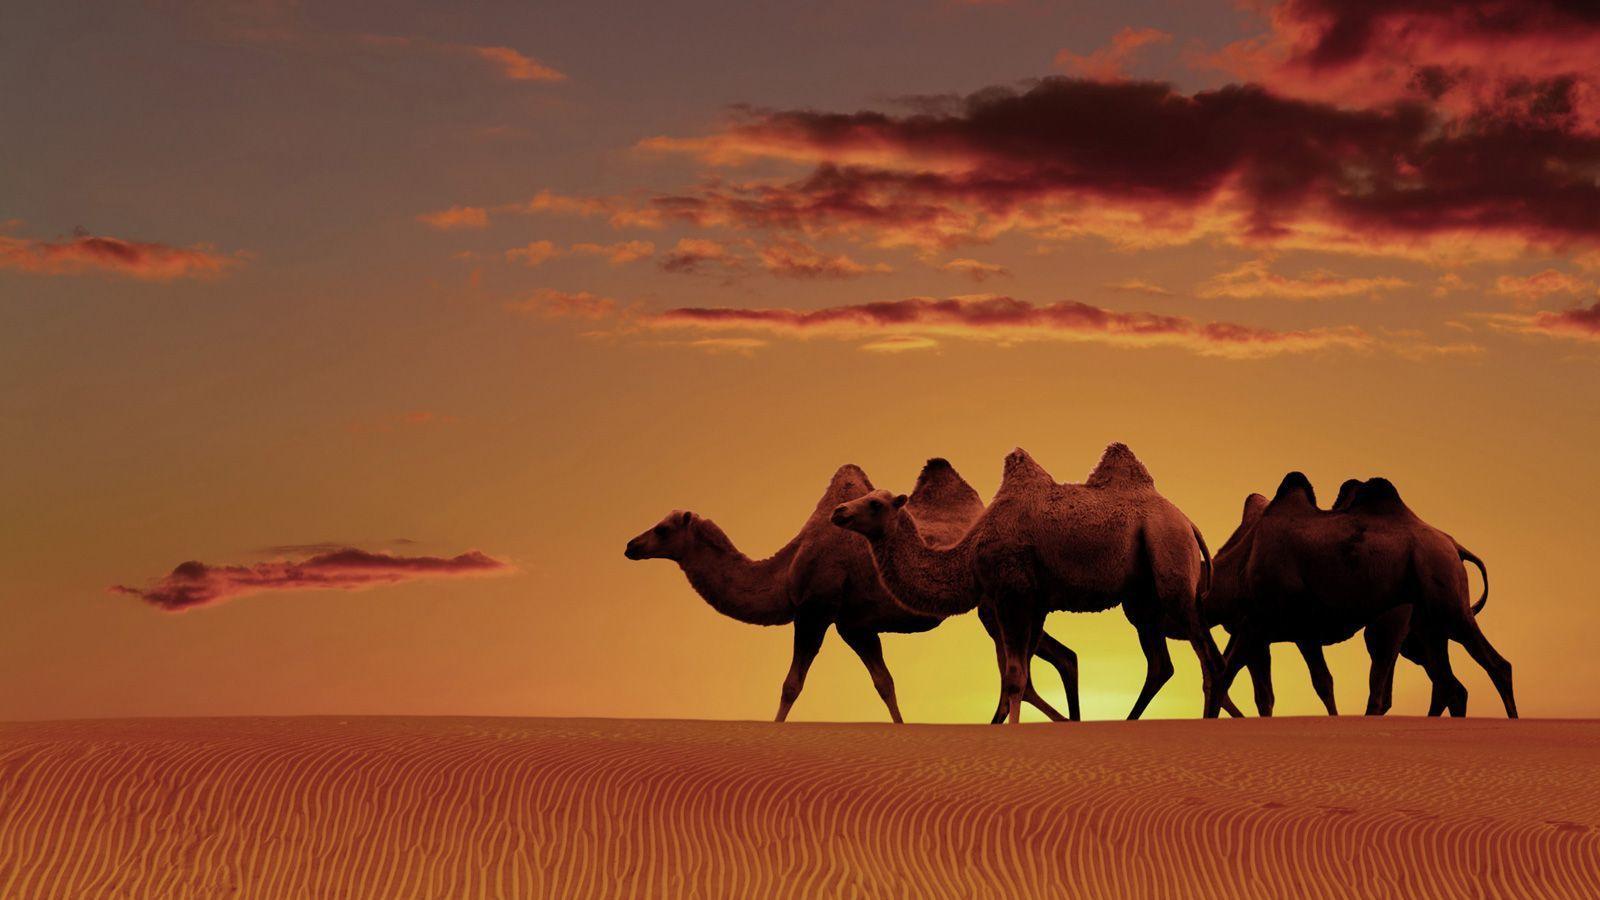 Arabian Desert Wallpapers Top Free Arabian Desert